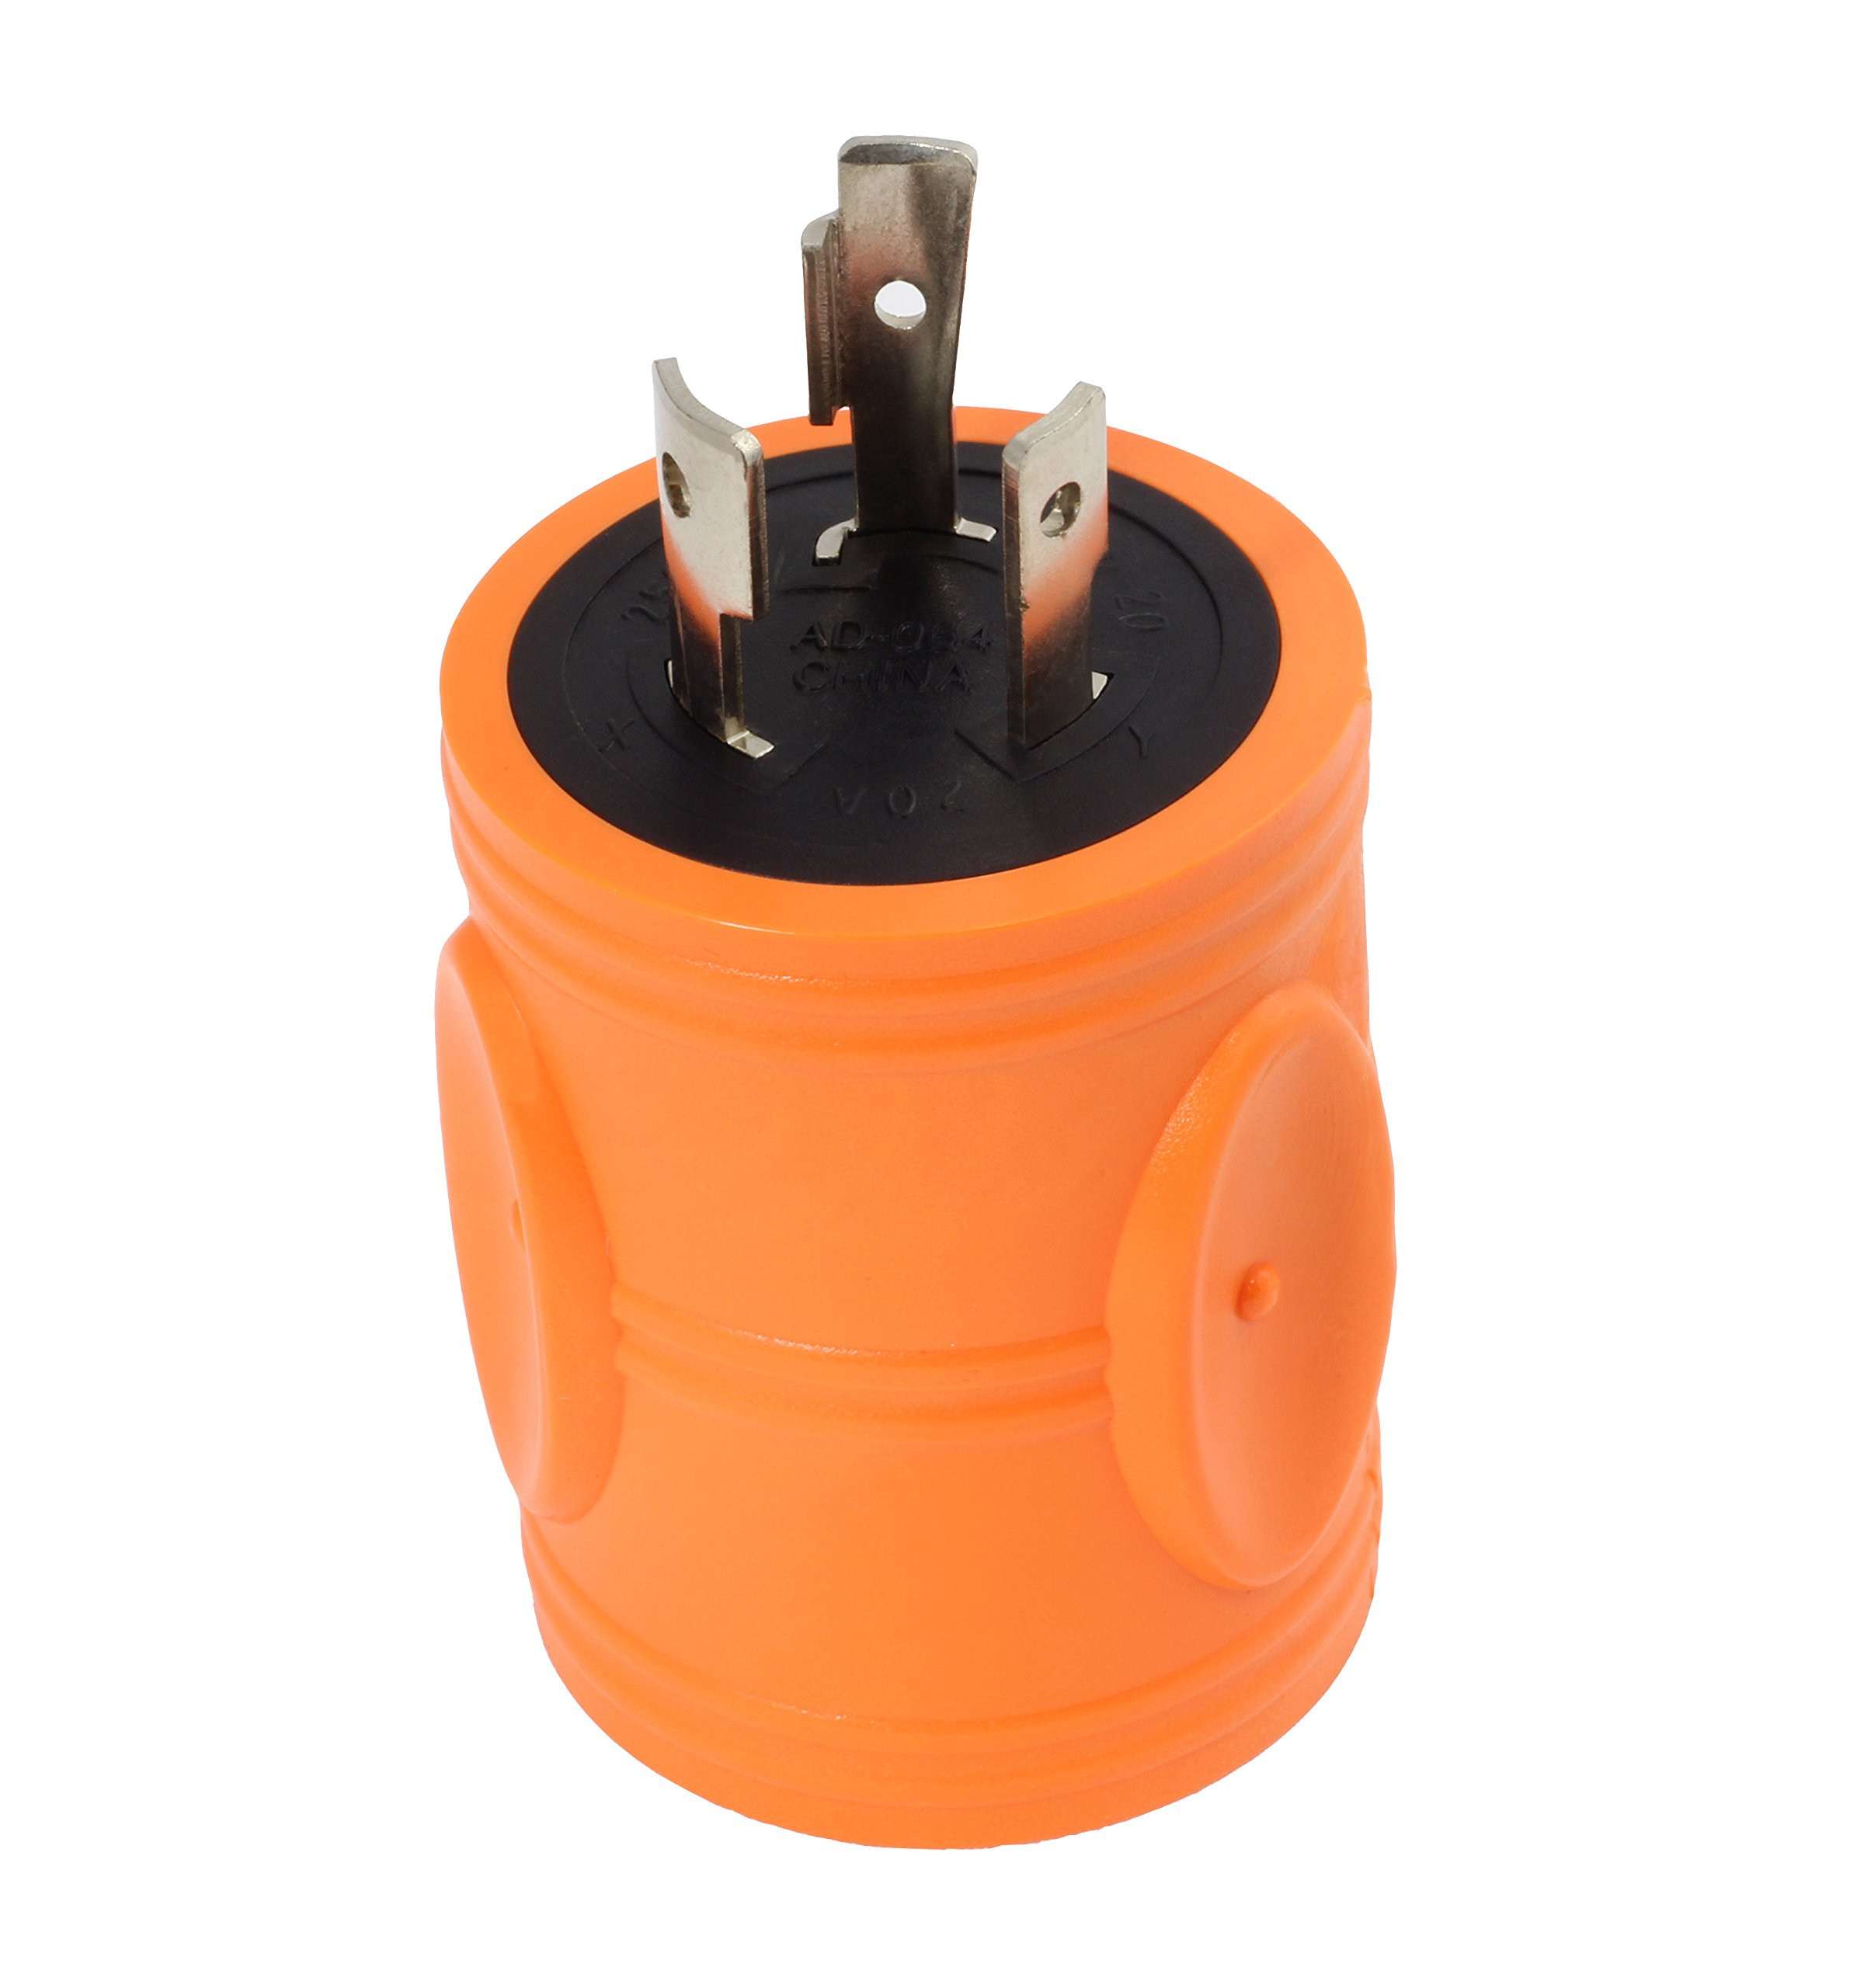 AC WORKS [ADL620620] NEMA L6-20P 20Amp 250Volt Locking Plug to NEMA 6-15/20R 15/20Amp 250Volt Female Connector Adapter by AC WORKS (Image #7)